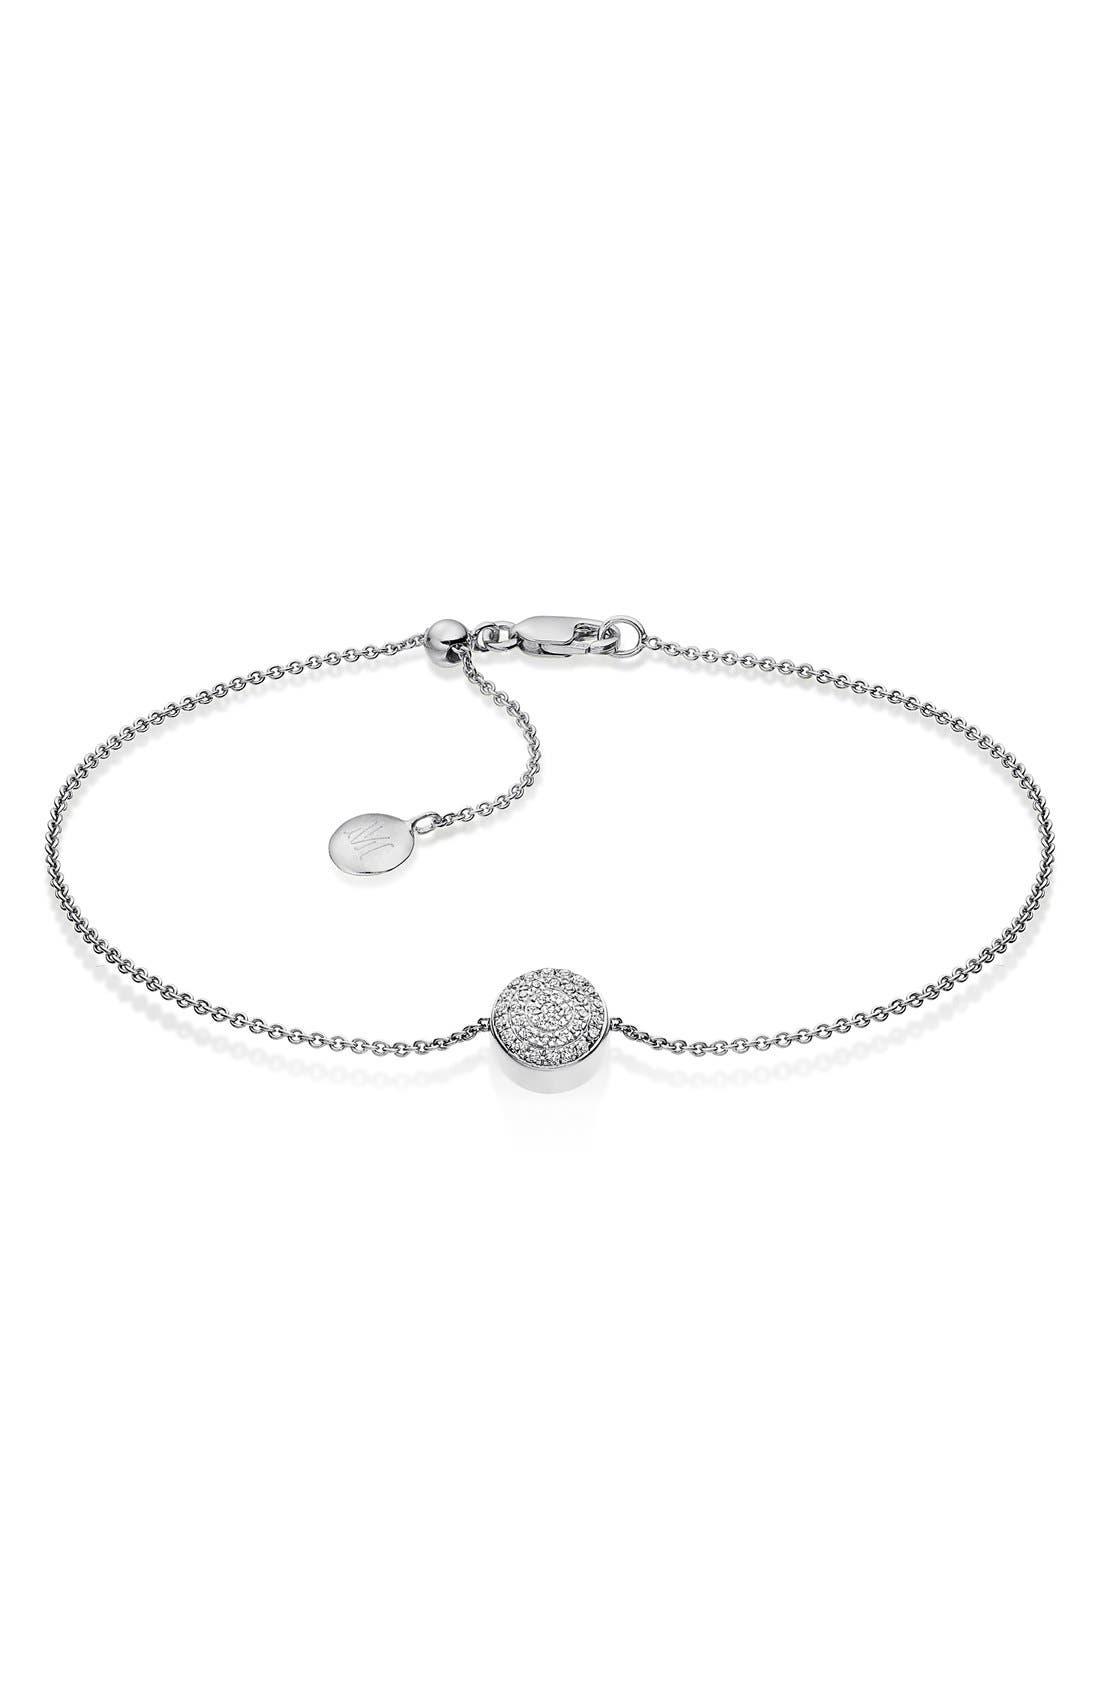 MONICA VINADER 'Ava' Diamond Button Bracelet, Main, color, SILVER